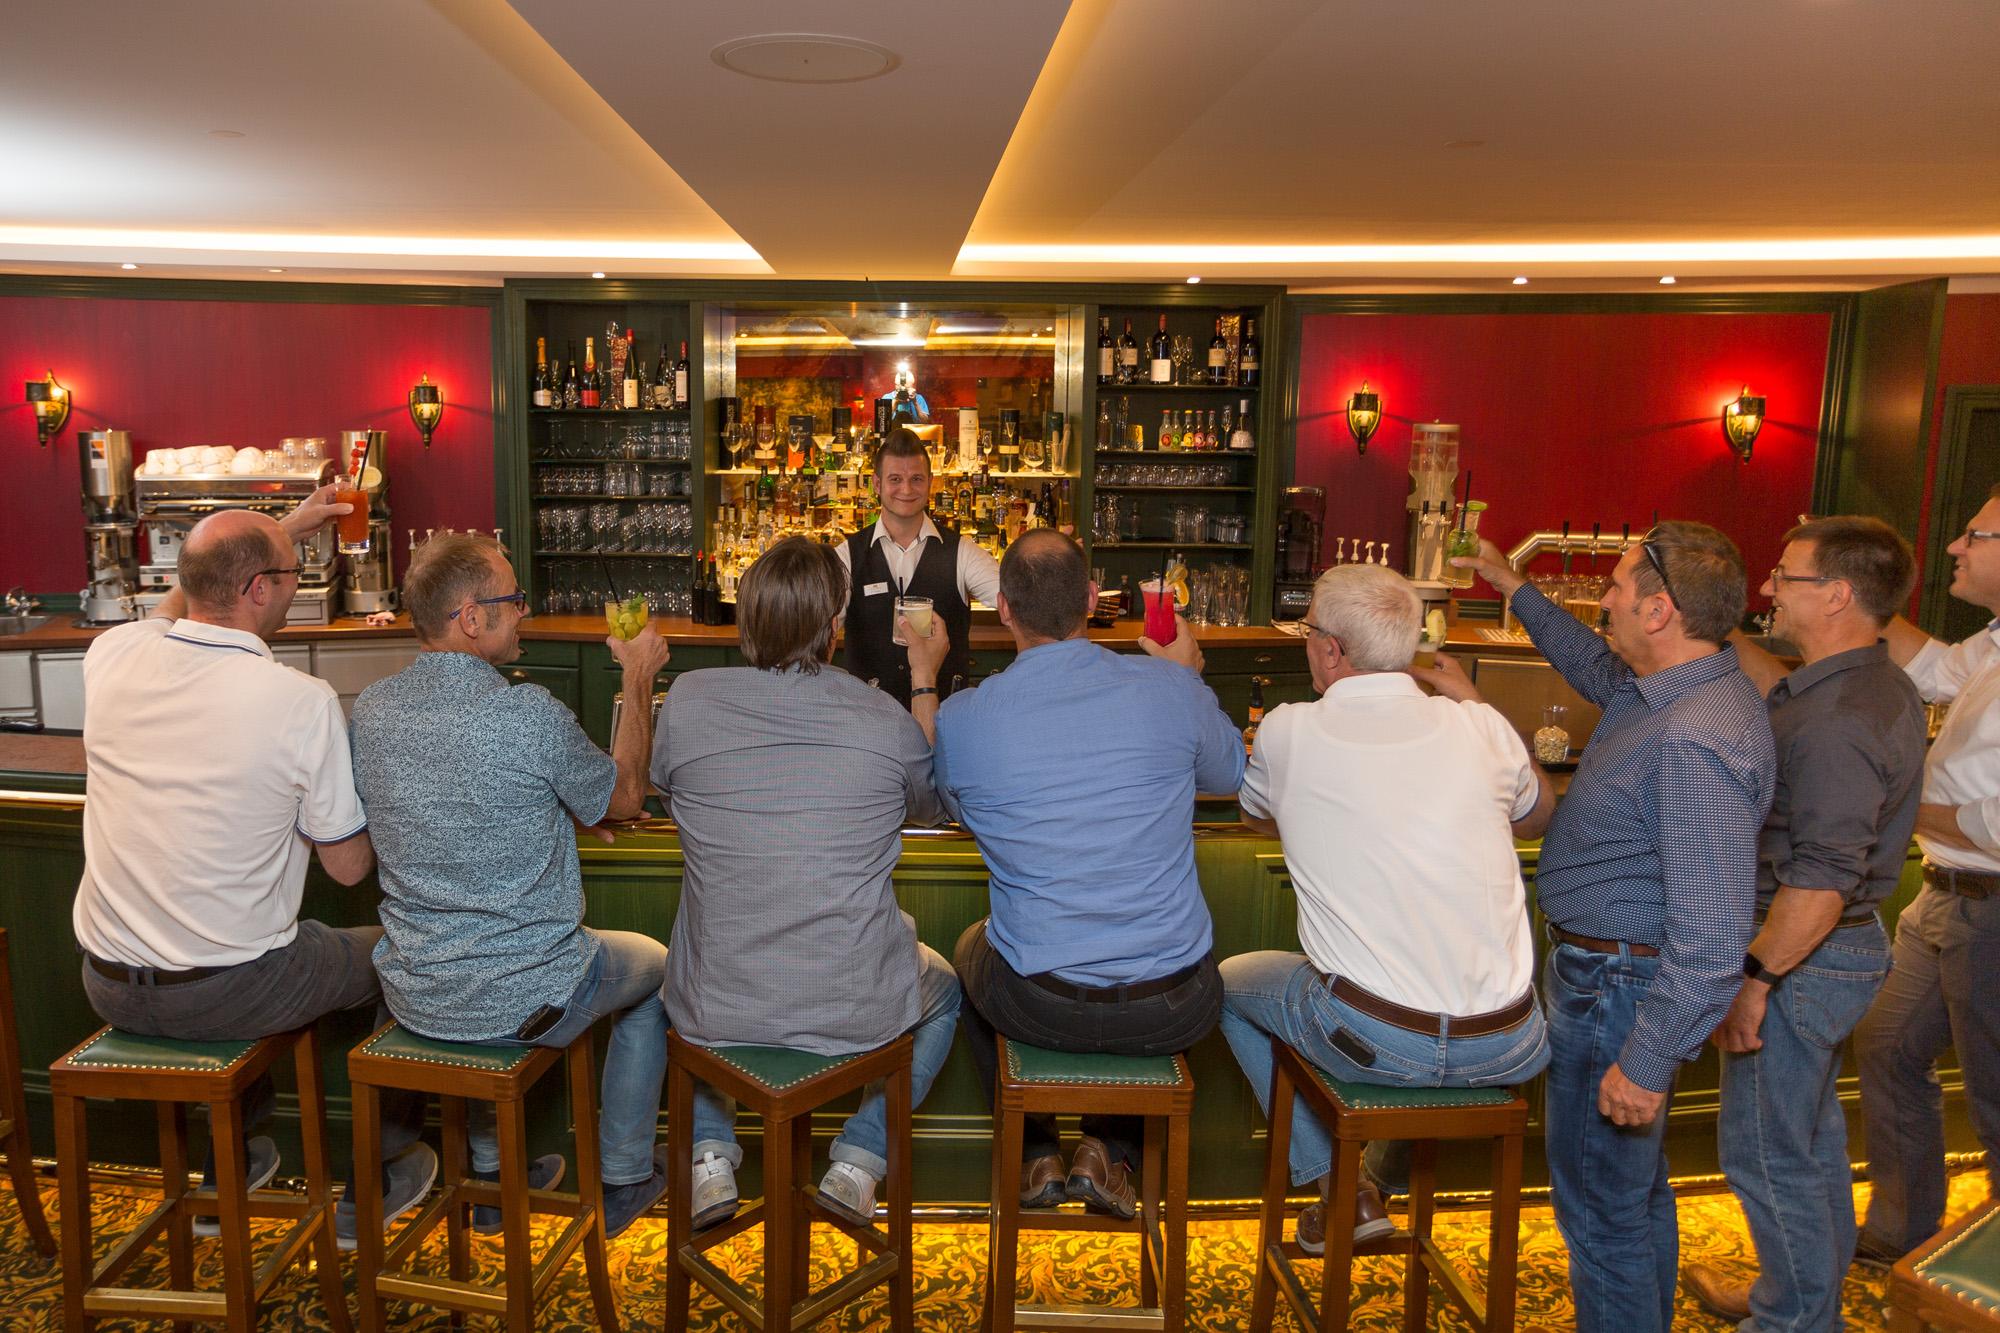 Restaurant Spreewald - Schloss-Restaurant LINARI - ROCCO`S Linari-Bar - Schloss Lübbenau im Spreewald